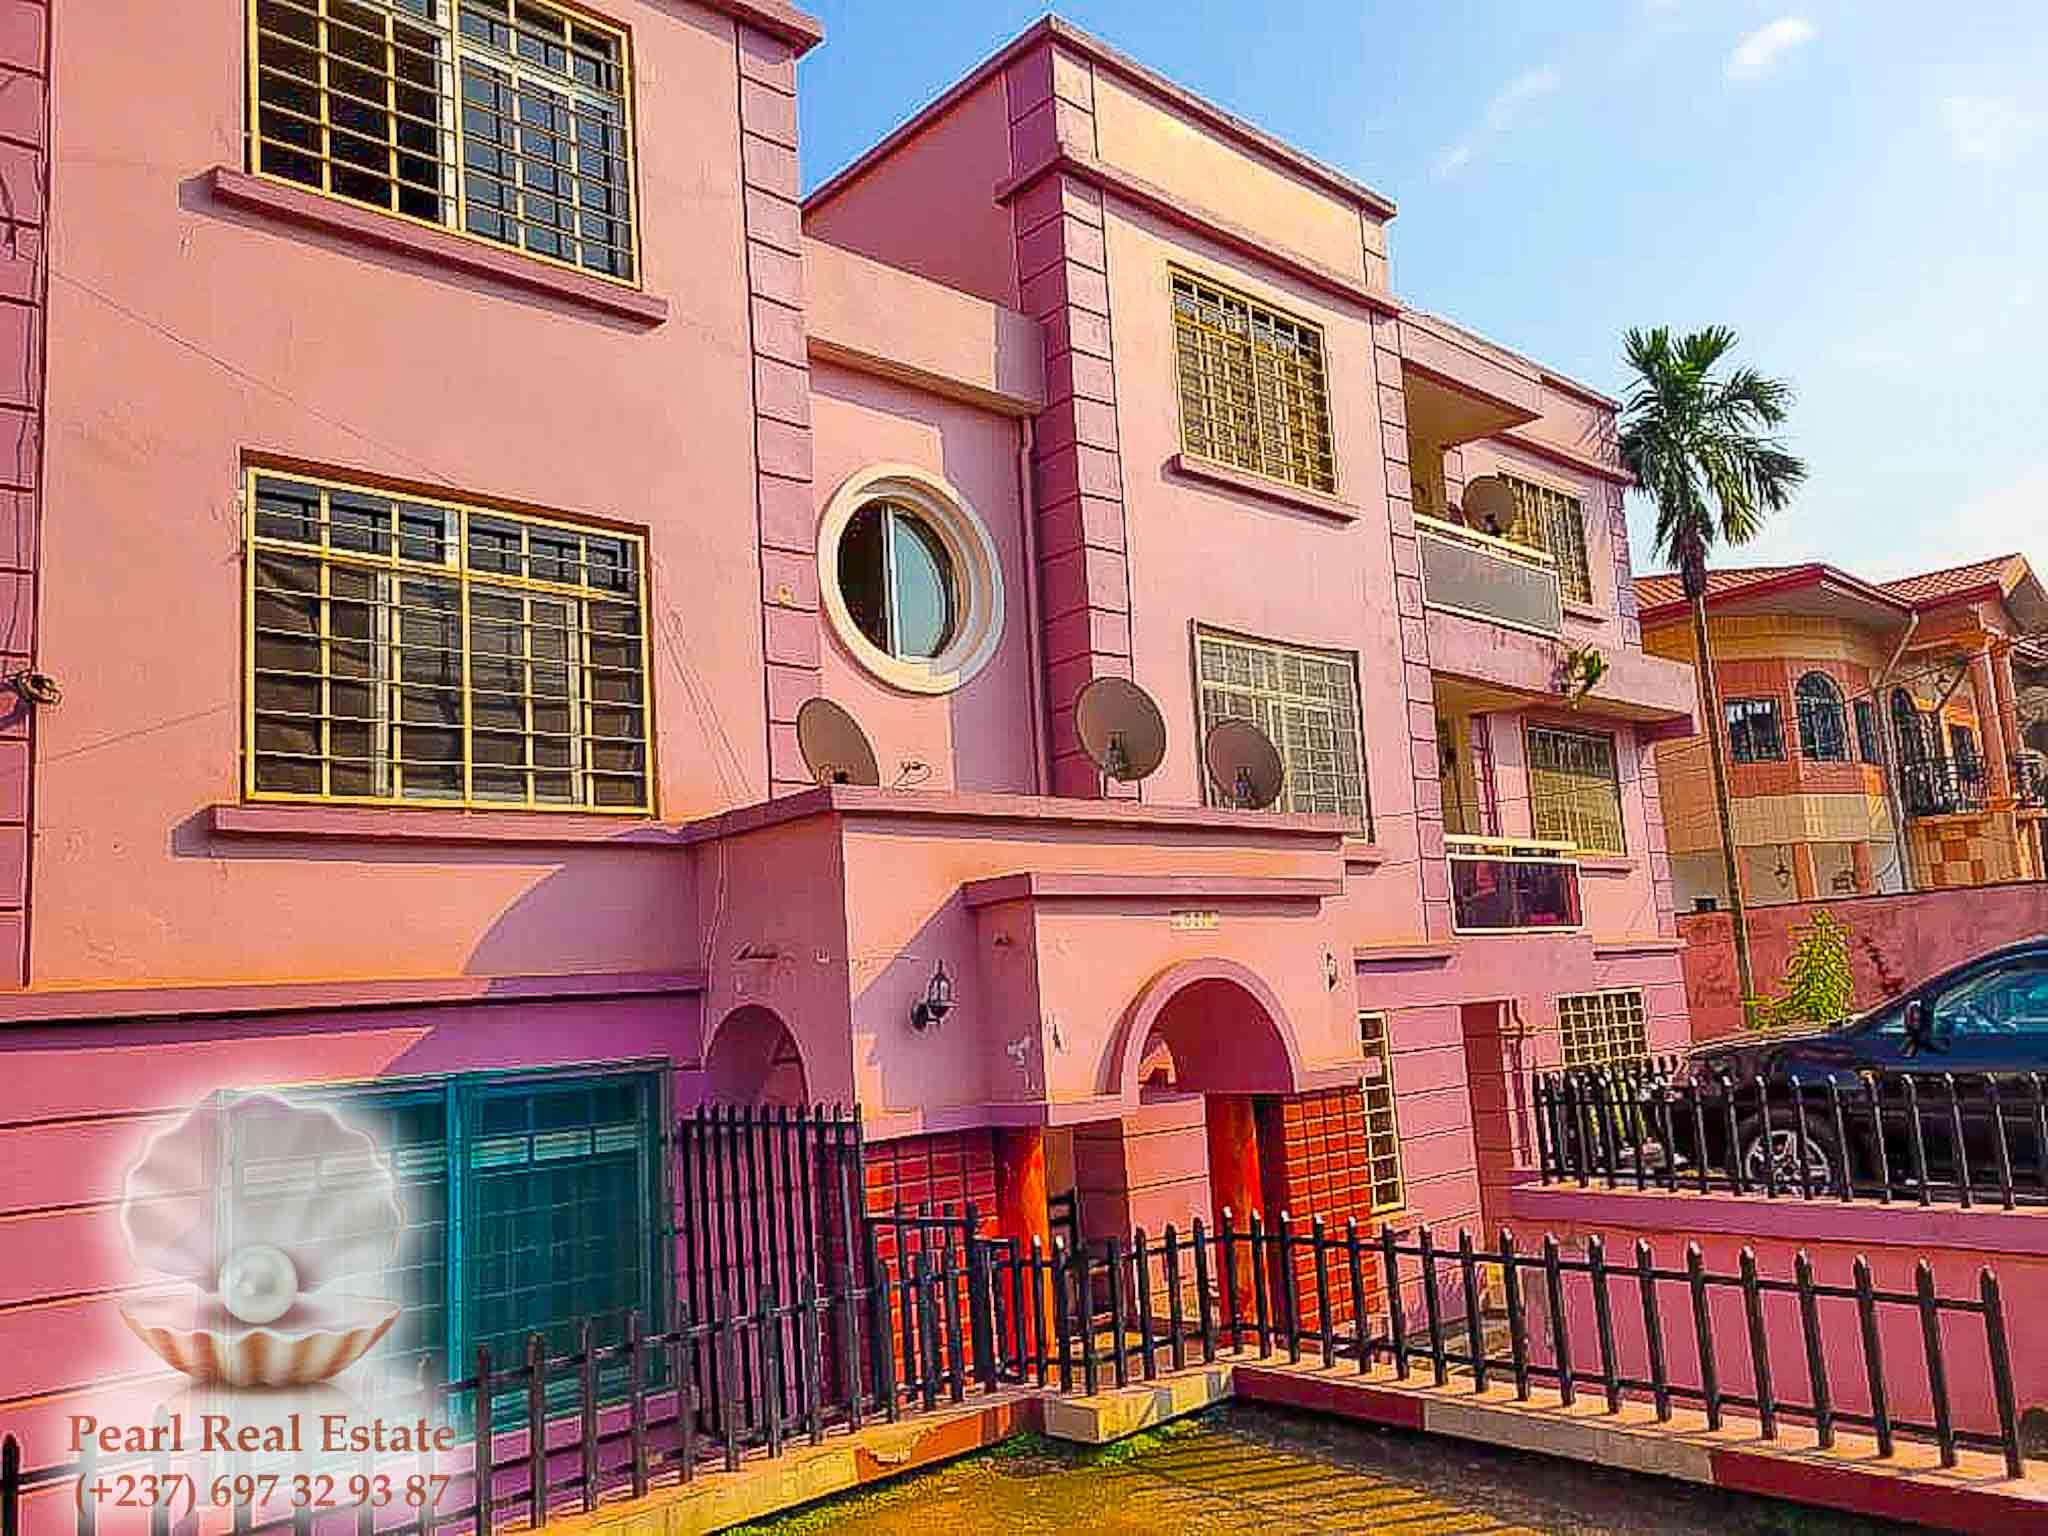 Apartment to rent - Yaoundé, Mfandena, Omnisports - 1 living room(s), 3 bedroom(s), 2 bathroom(s) - 350 000 FCFA / month